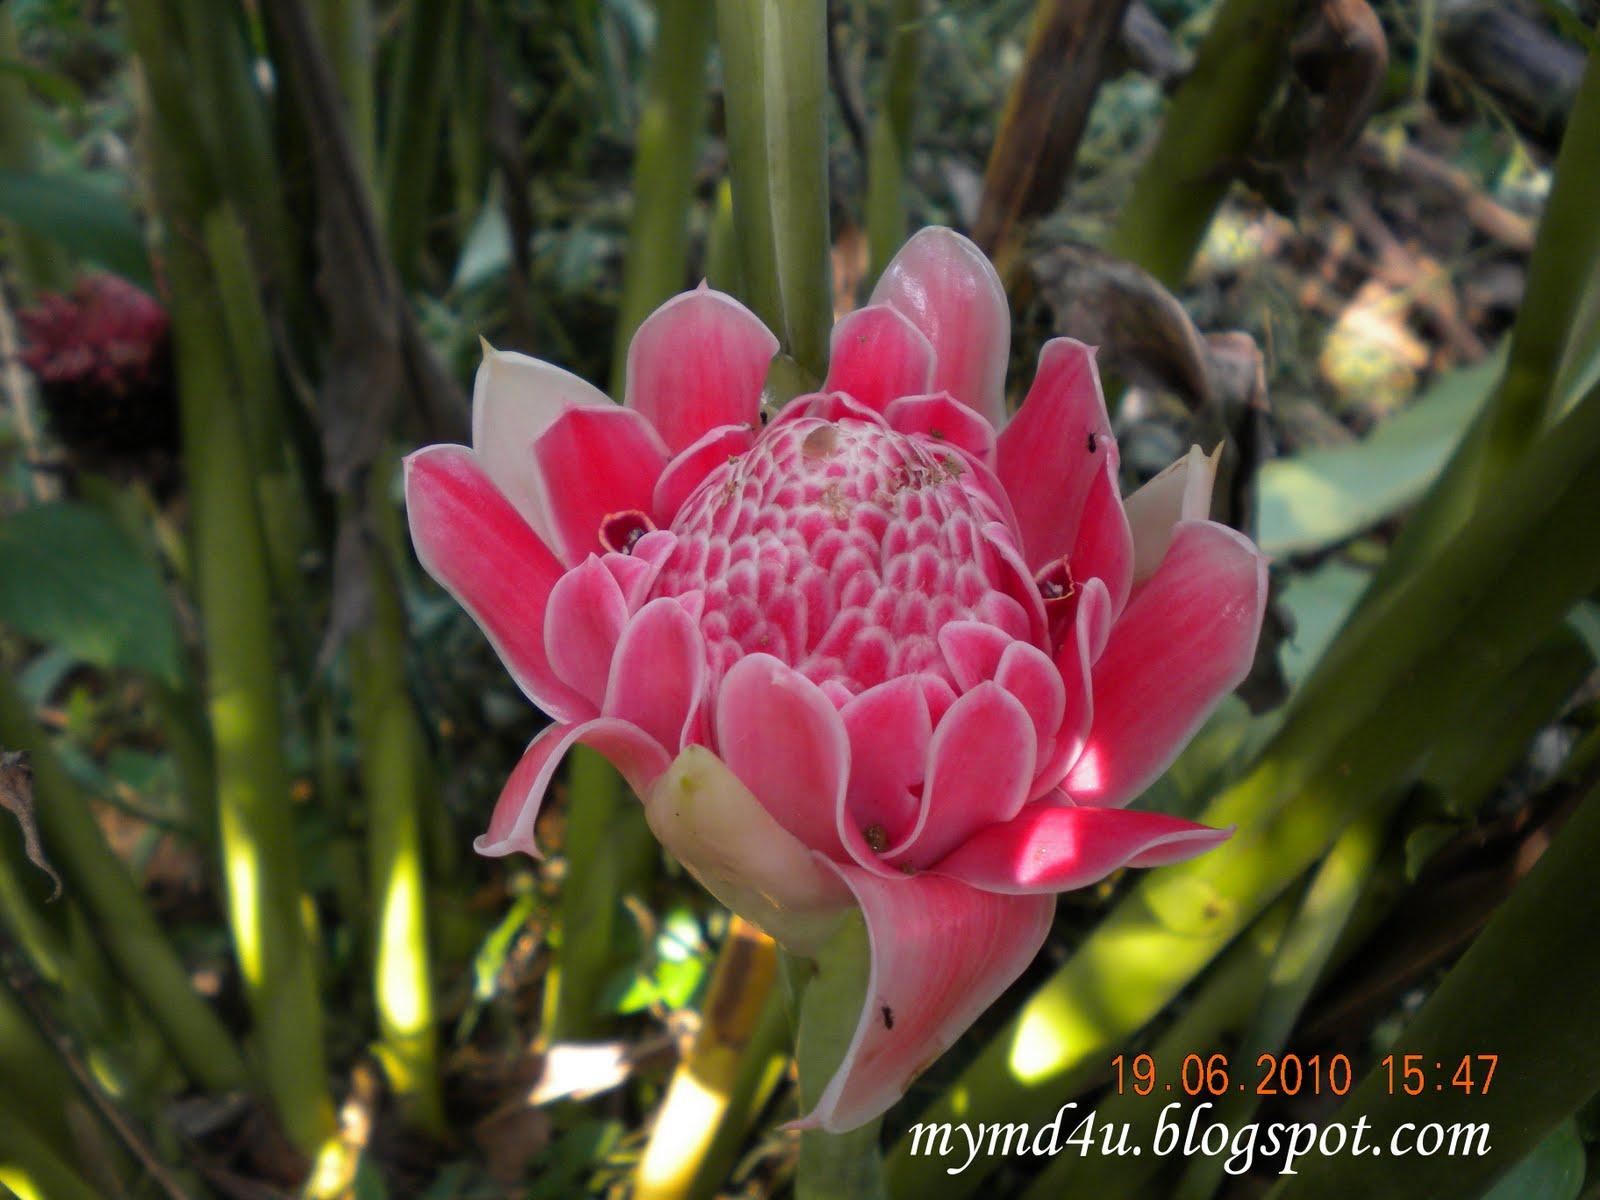 Bunga Kantan Cantik Dimata Enak Dimakan